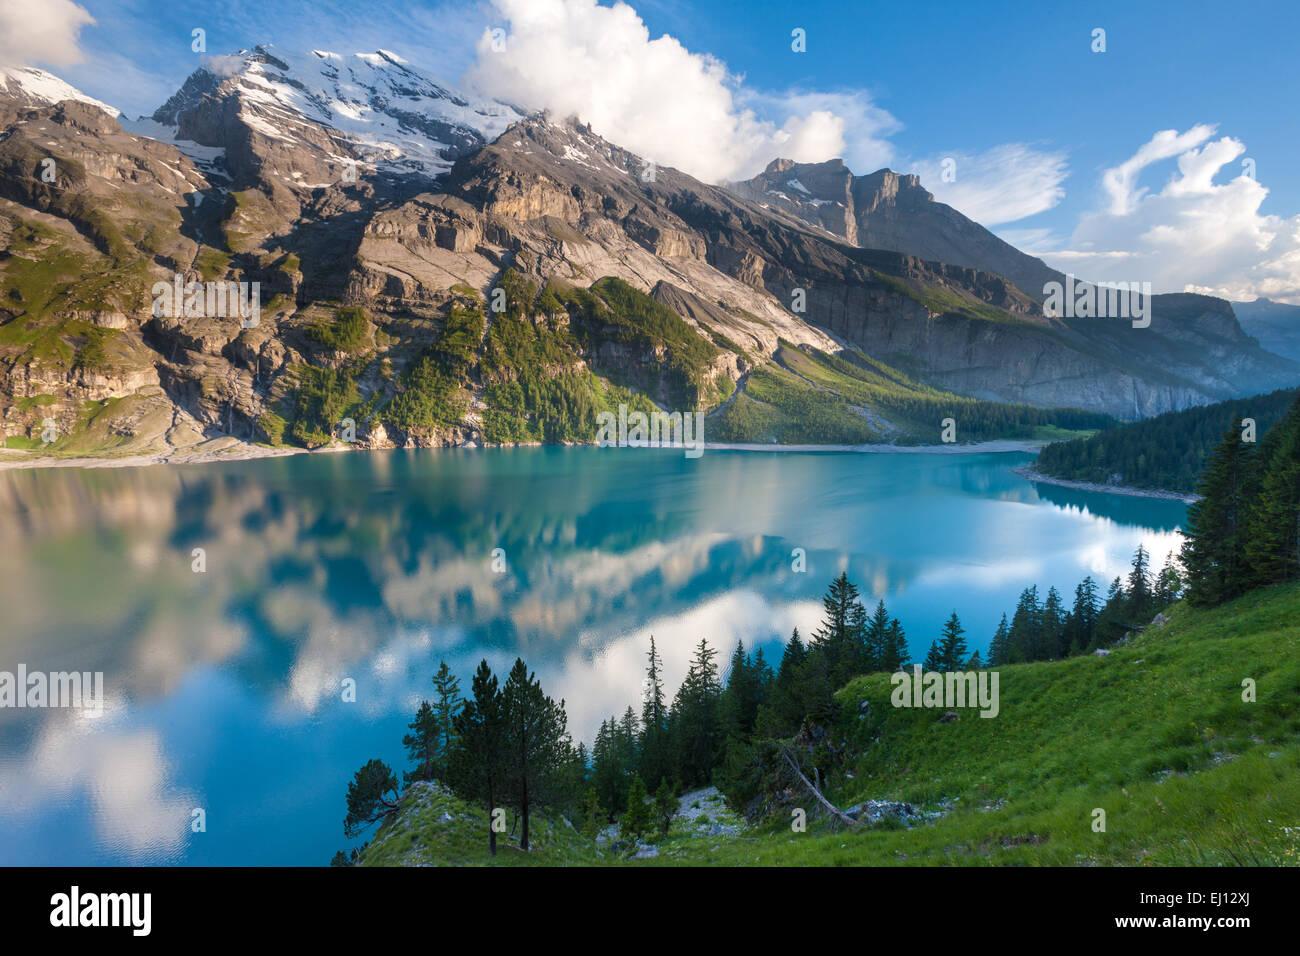 Lake of Oeschinen, Switzerland, Europe, canton Bern, Bernese  Oberland, Kandertal, mountain lake, lake, mountains, - Stock Image